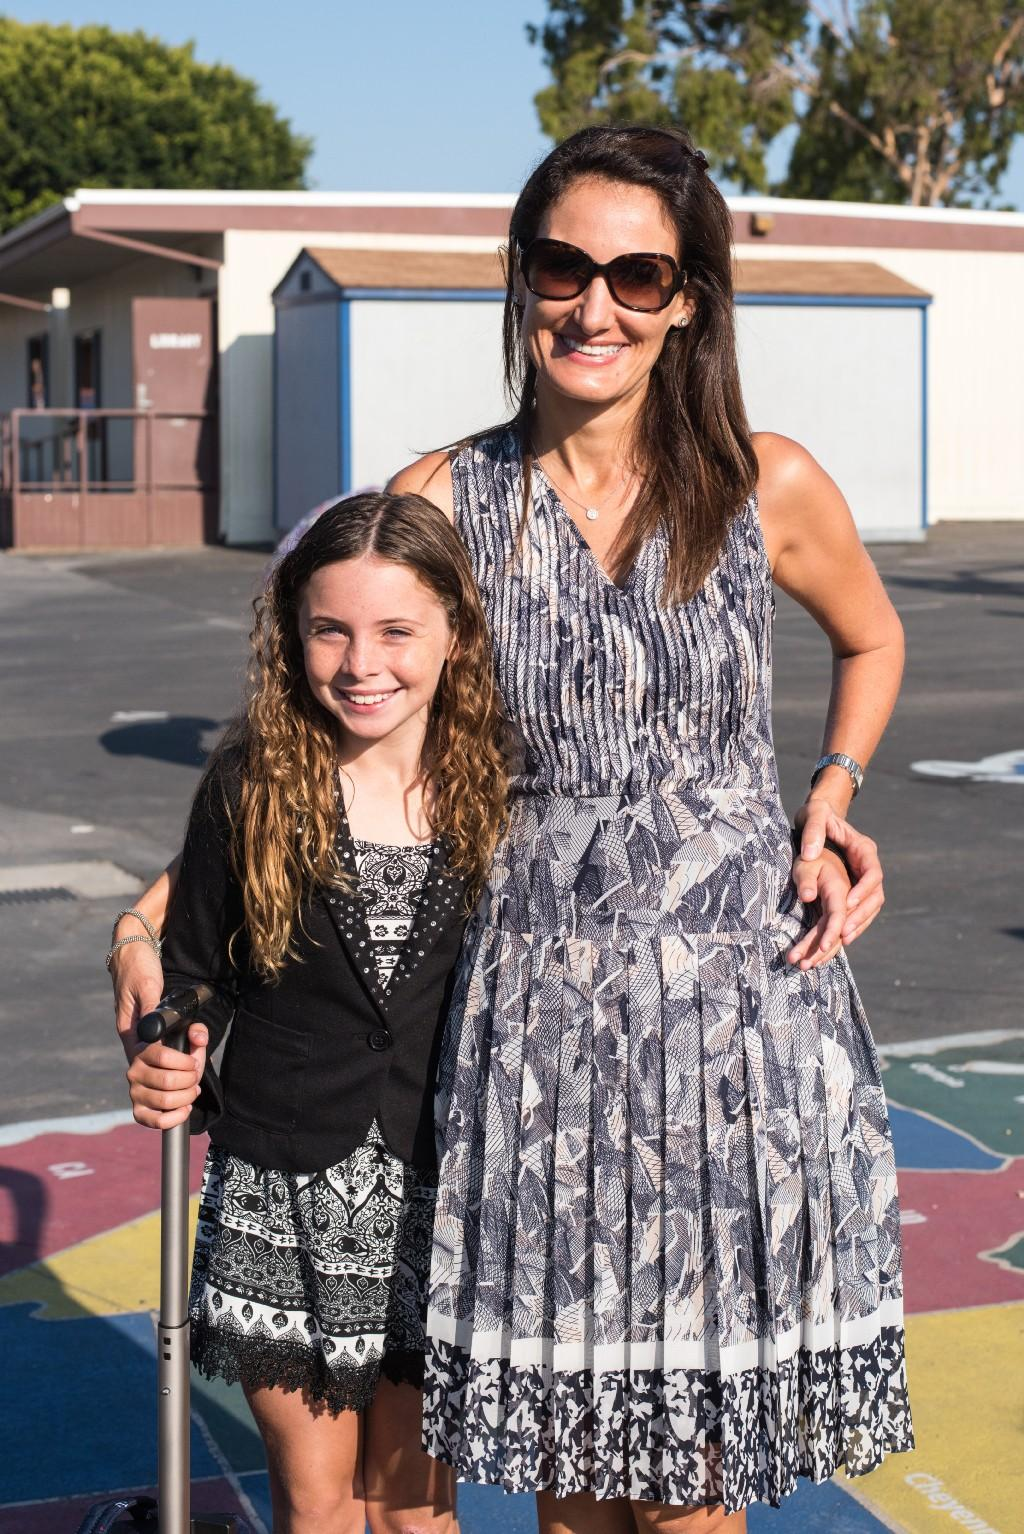 Principal with Student